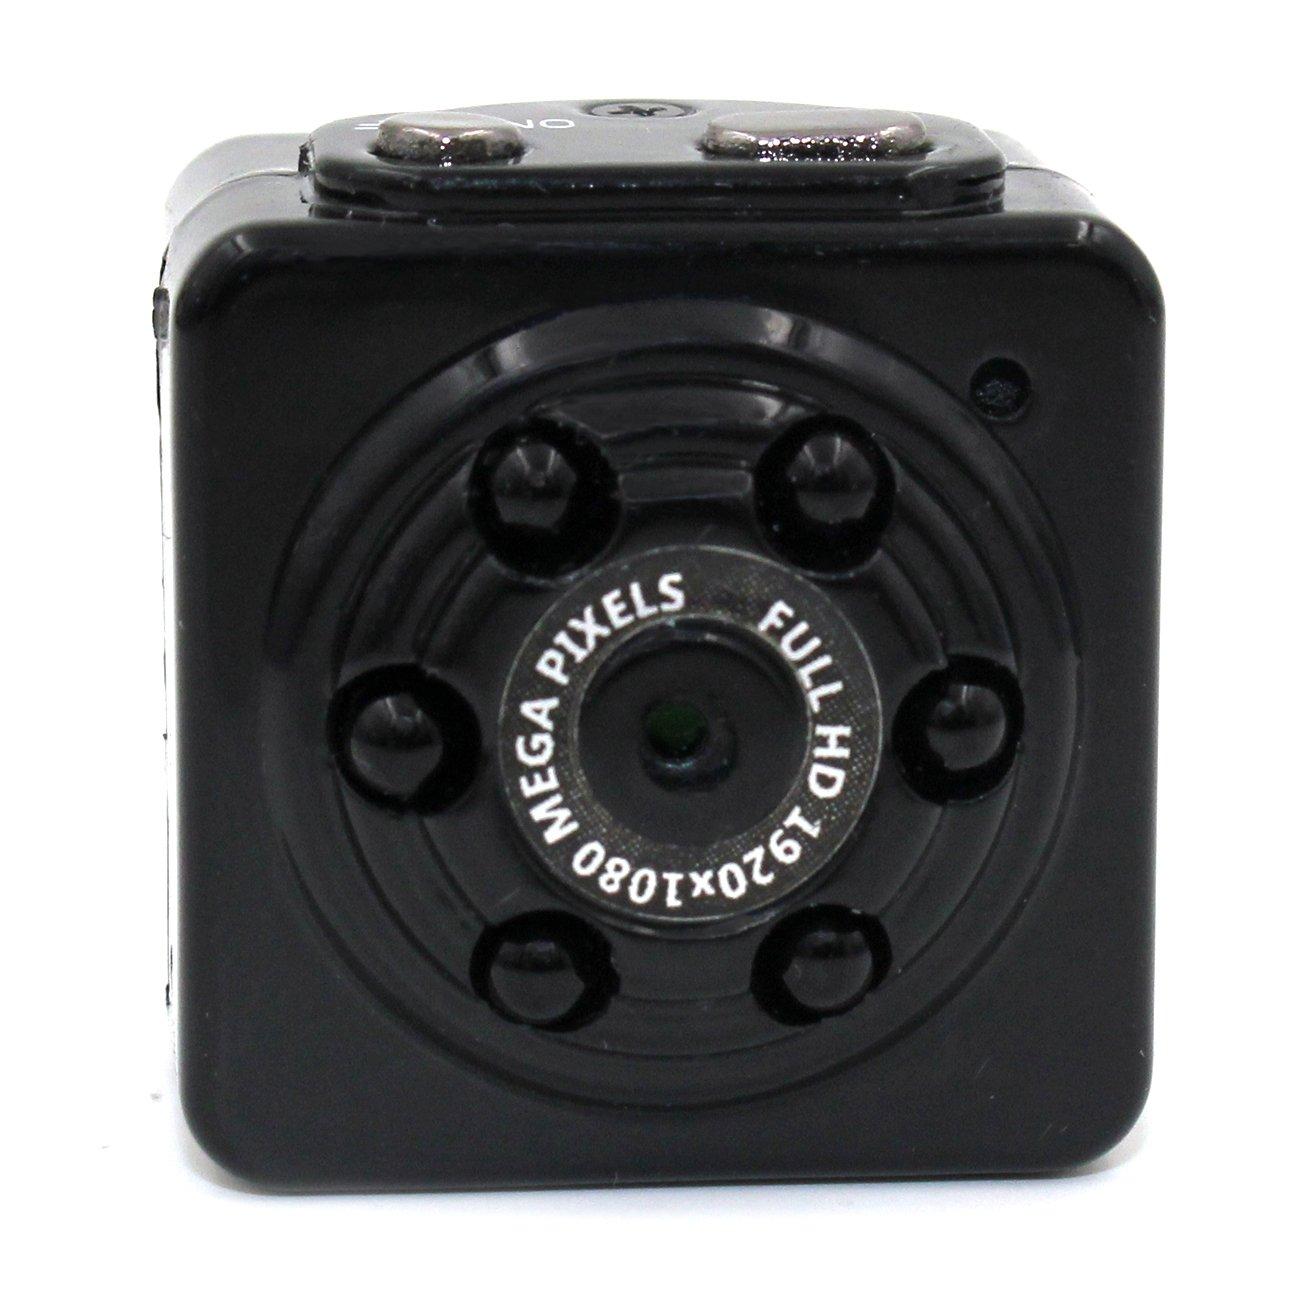 Mini DV Camera, Powpro PP-SQ9 Protable Video Record 1080P Full HD Car DVR DV Sport Handheld Infrared Night Vision Mini Video Camcorder